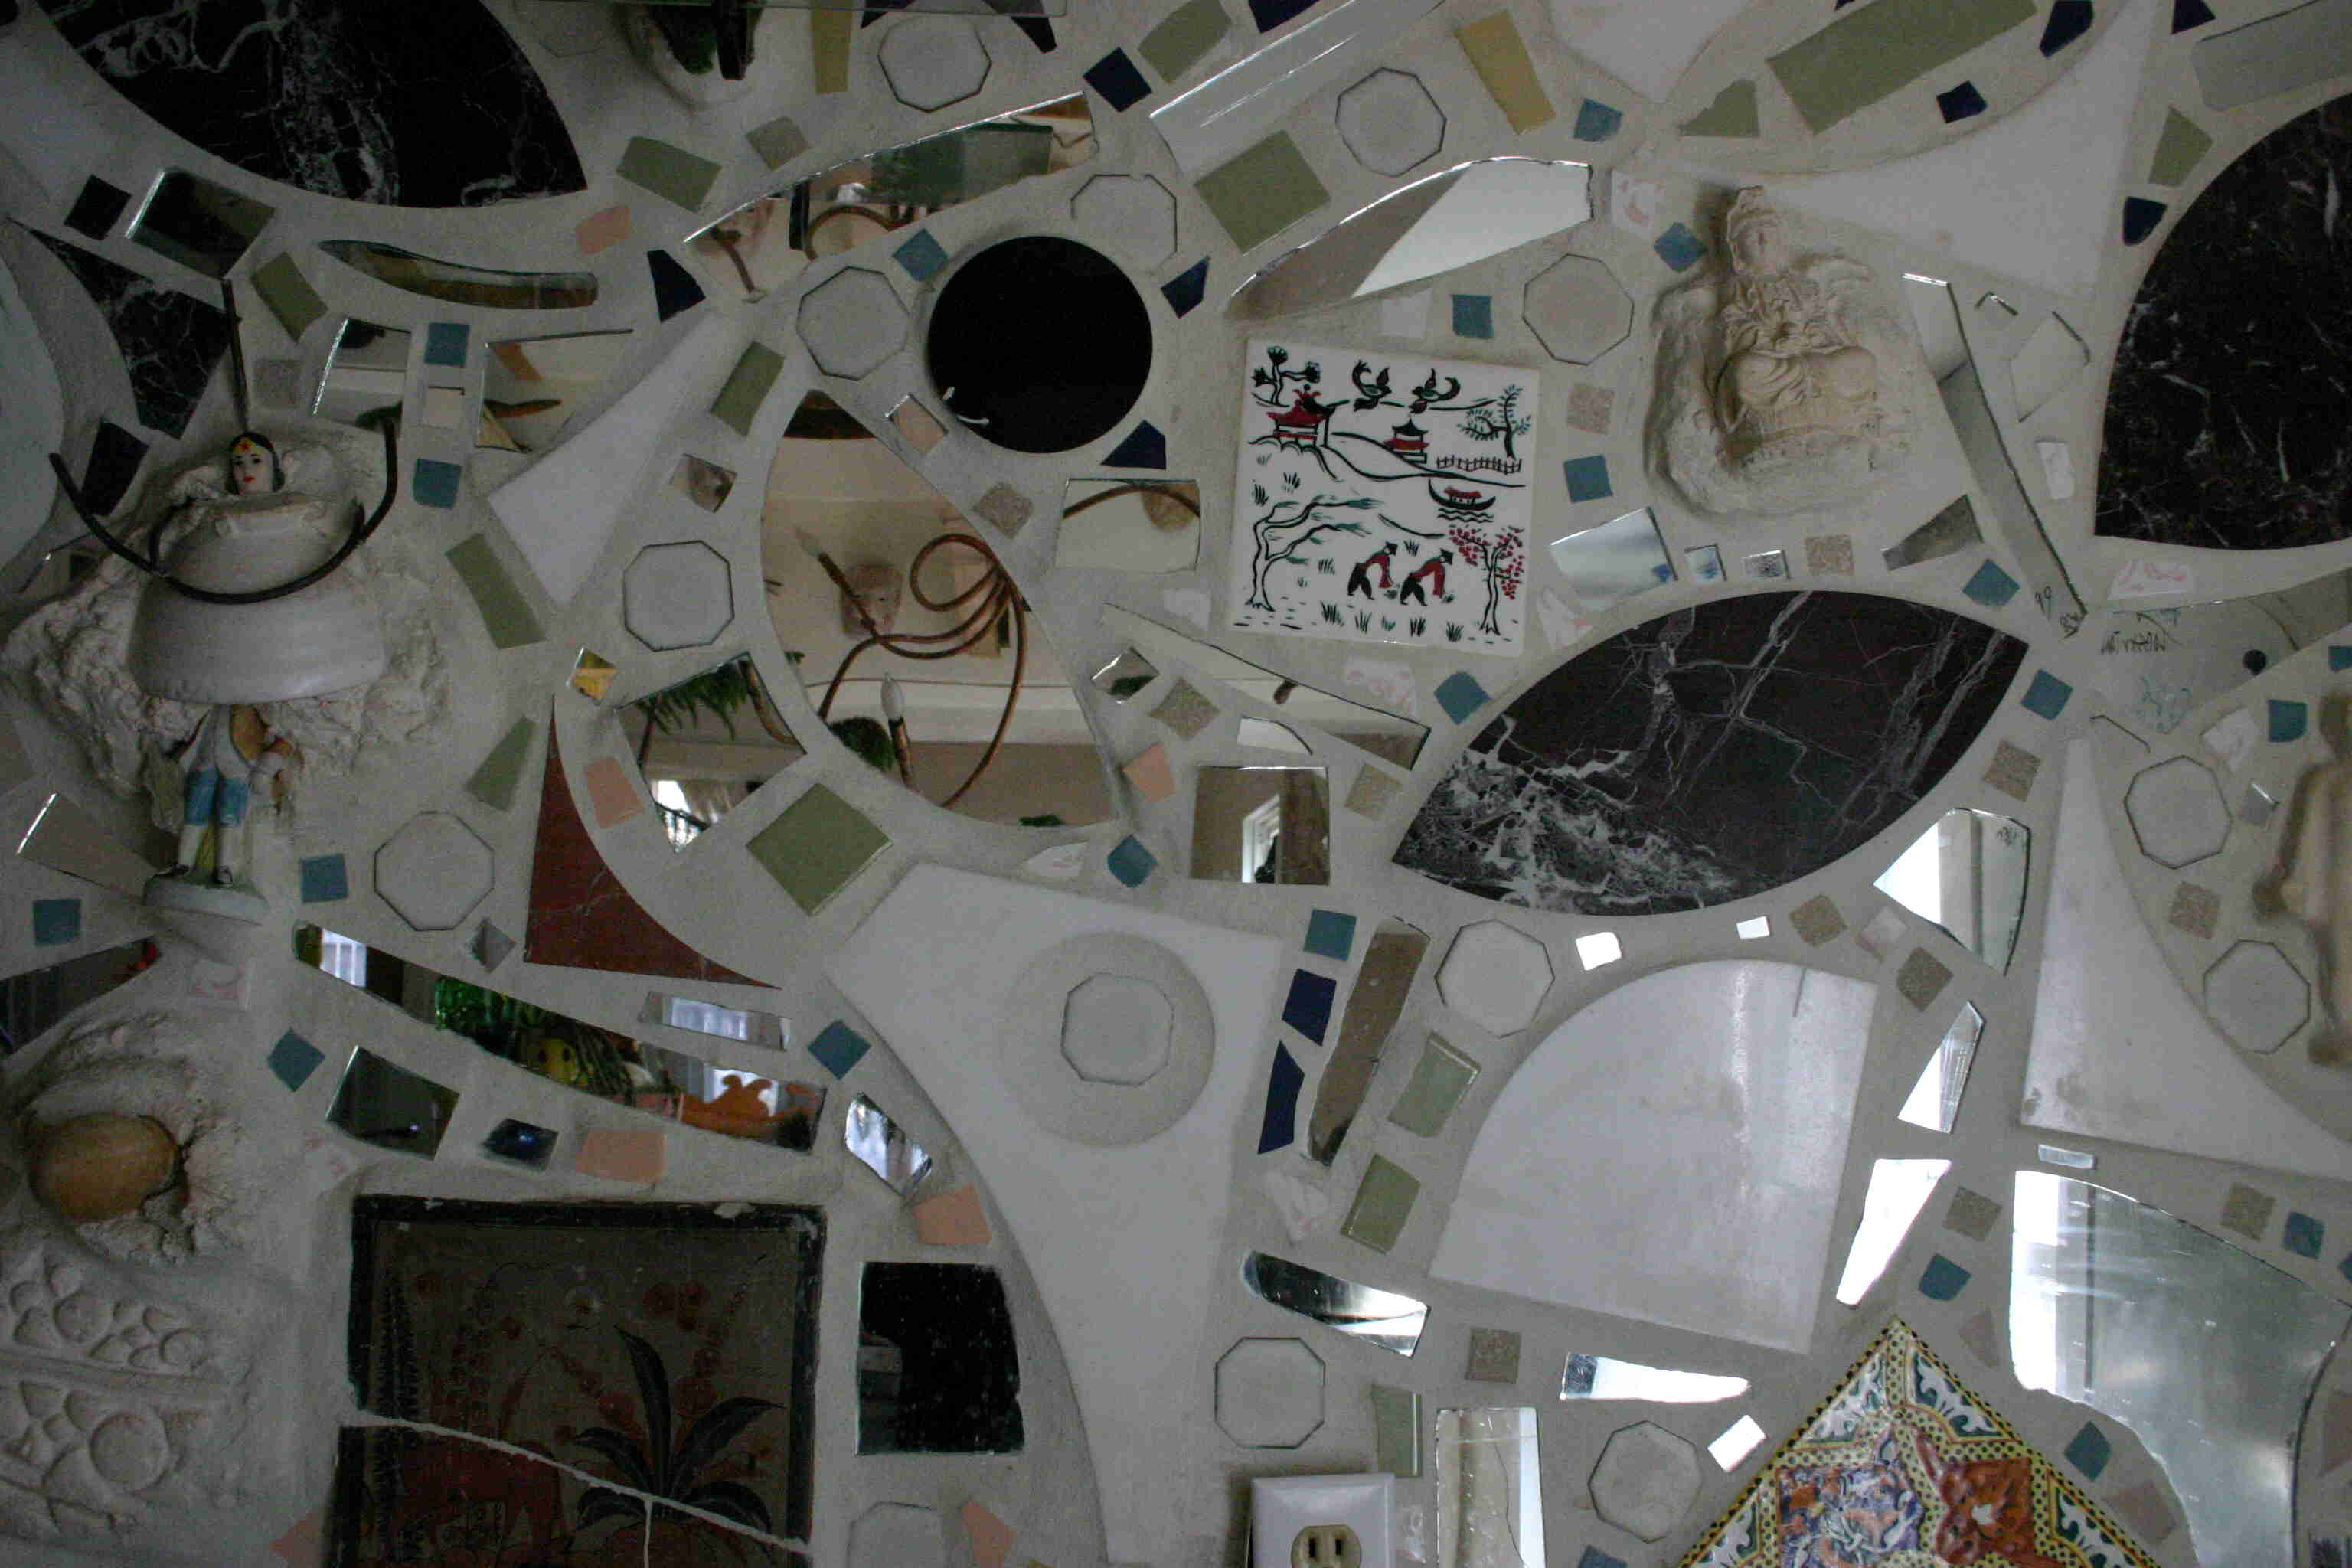 MAP office, Mosaic Mural